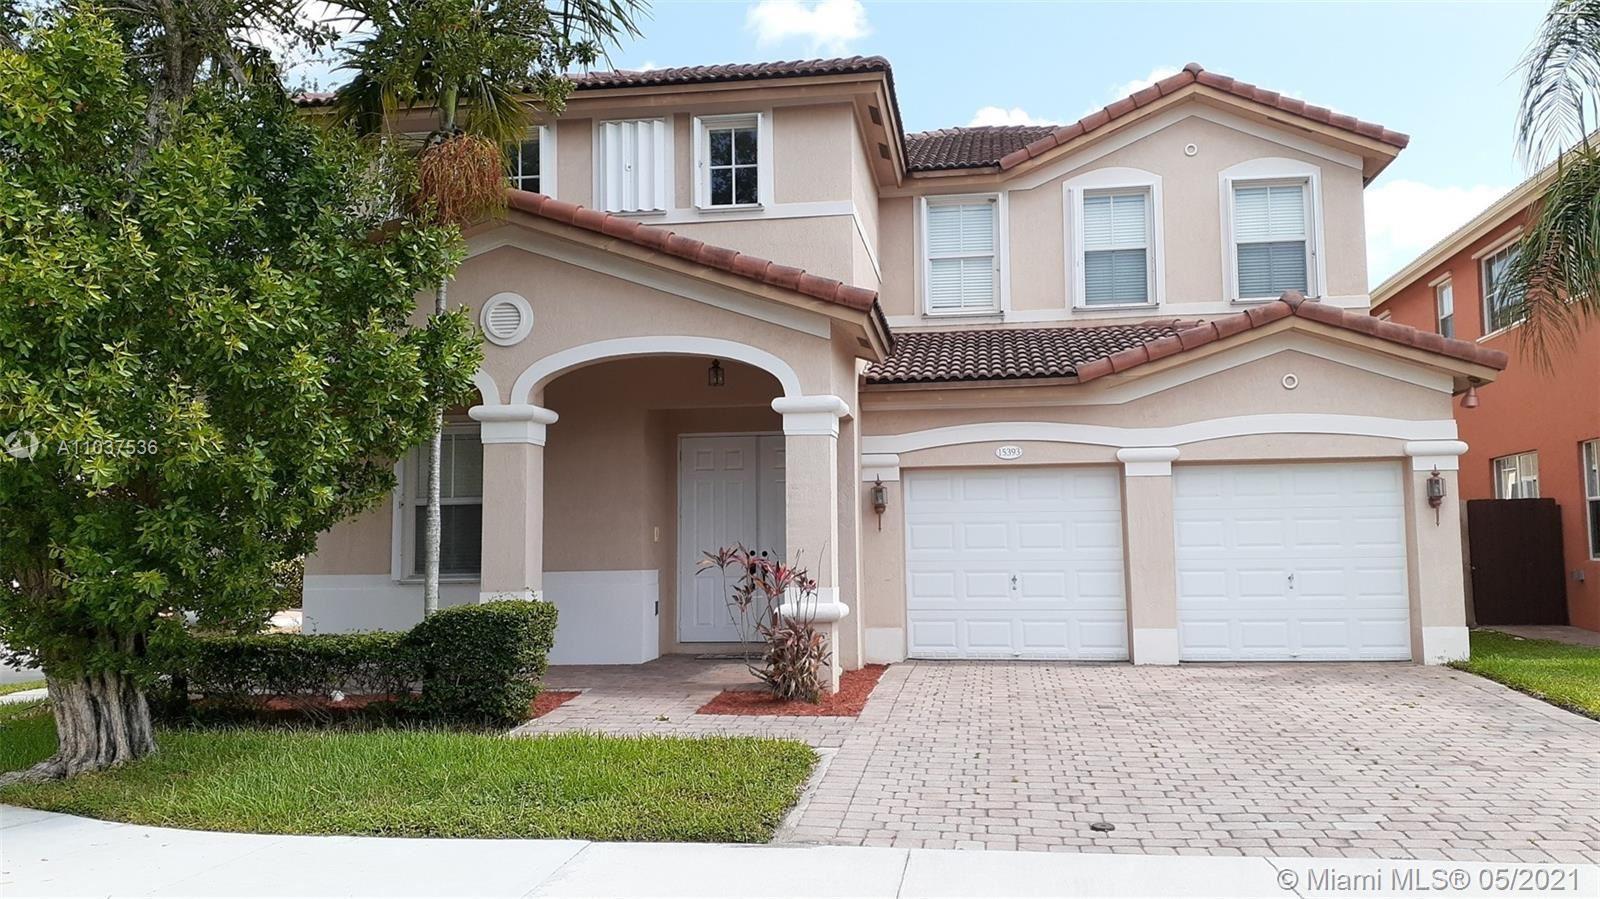 15393 SW 93rd St, Miami, FL 33196 - #: A11037536